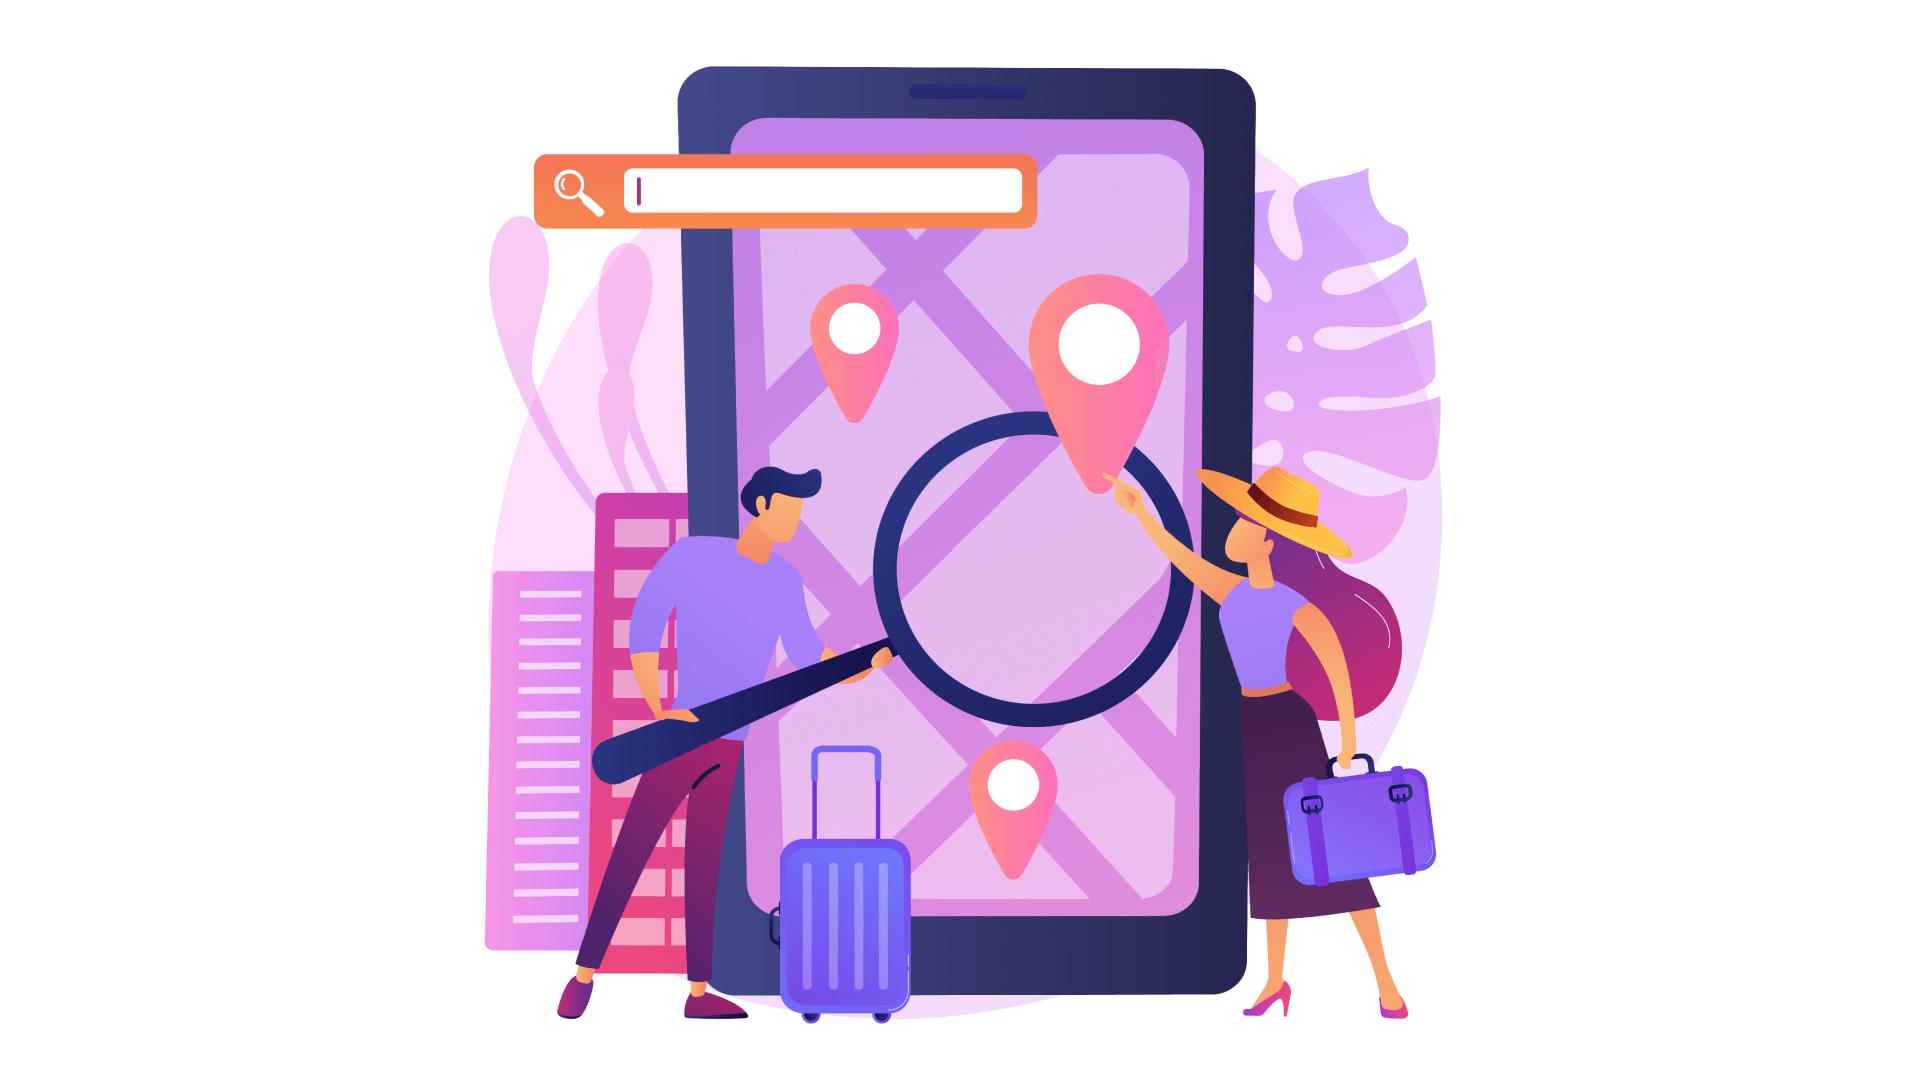 How location-aware mobile apps revolutionize digital services.